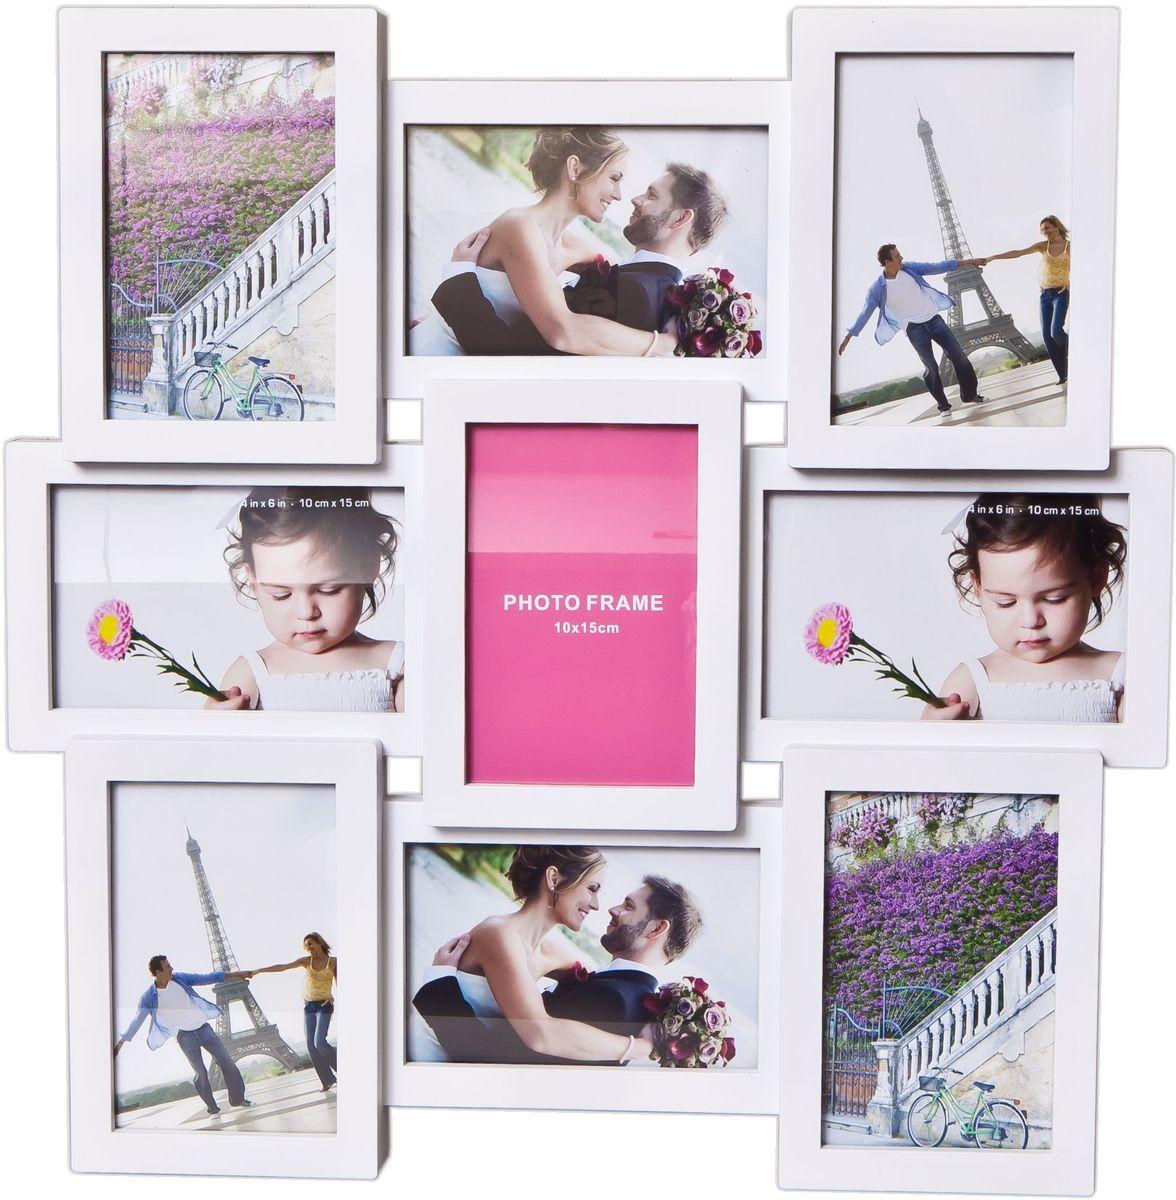 Коллаж Platinum, цвет: белый, 9 фоторамок. BH-2209PLATINUM BH-2209B-White-БелыйПластиковый коллаж с 9 фото 10х15 см.